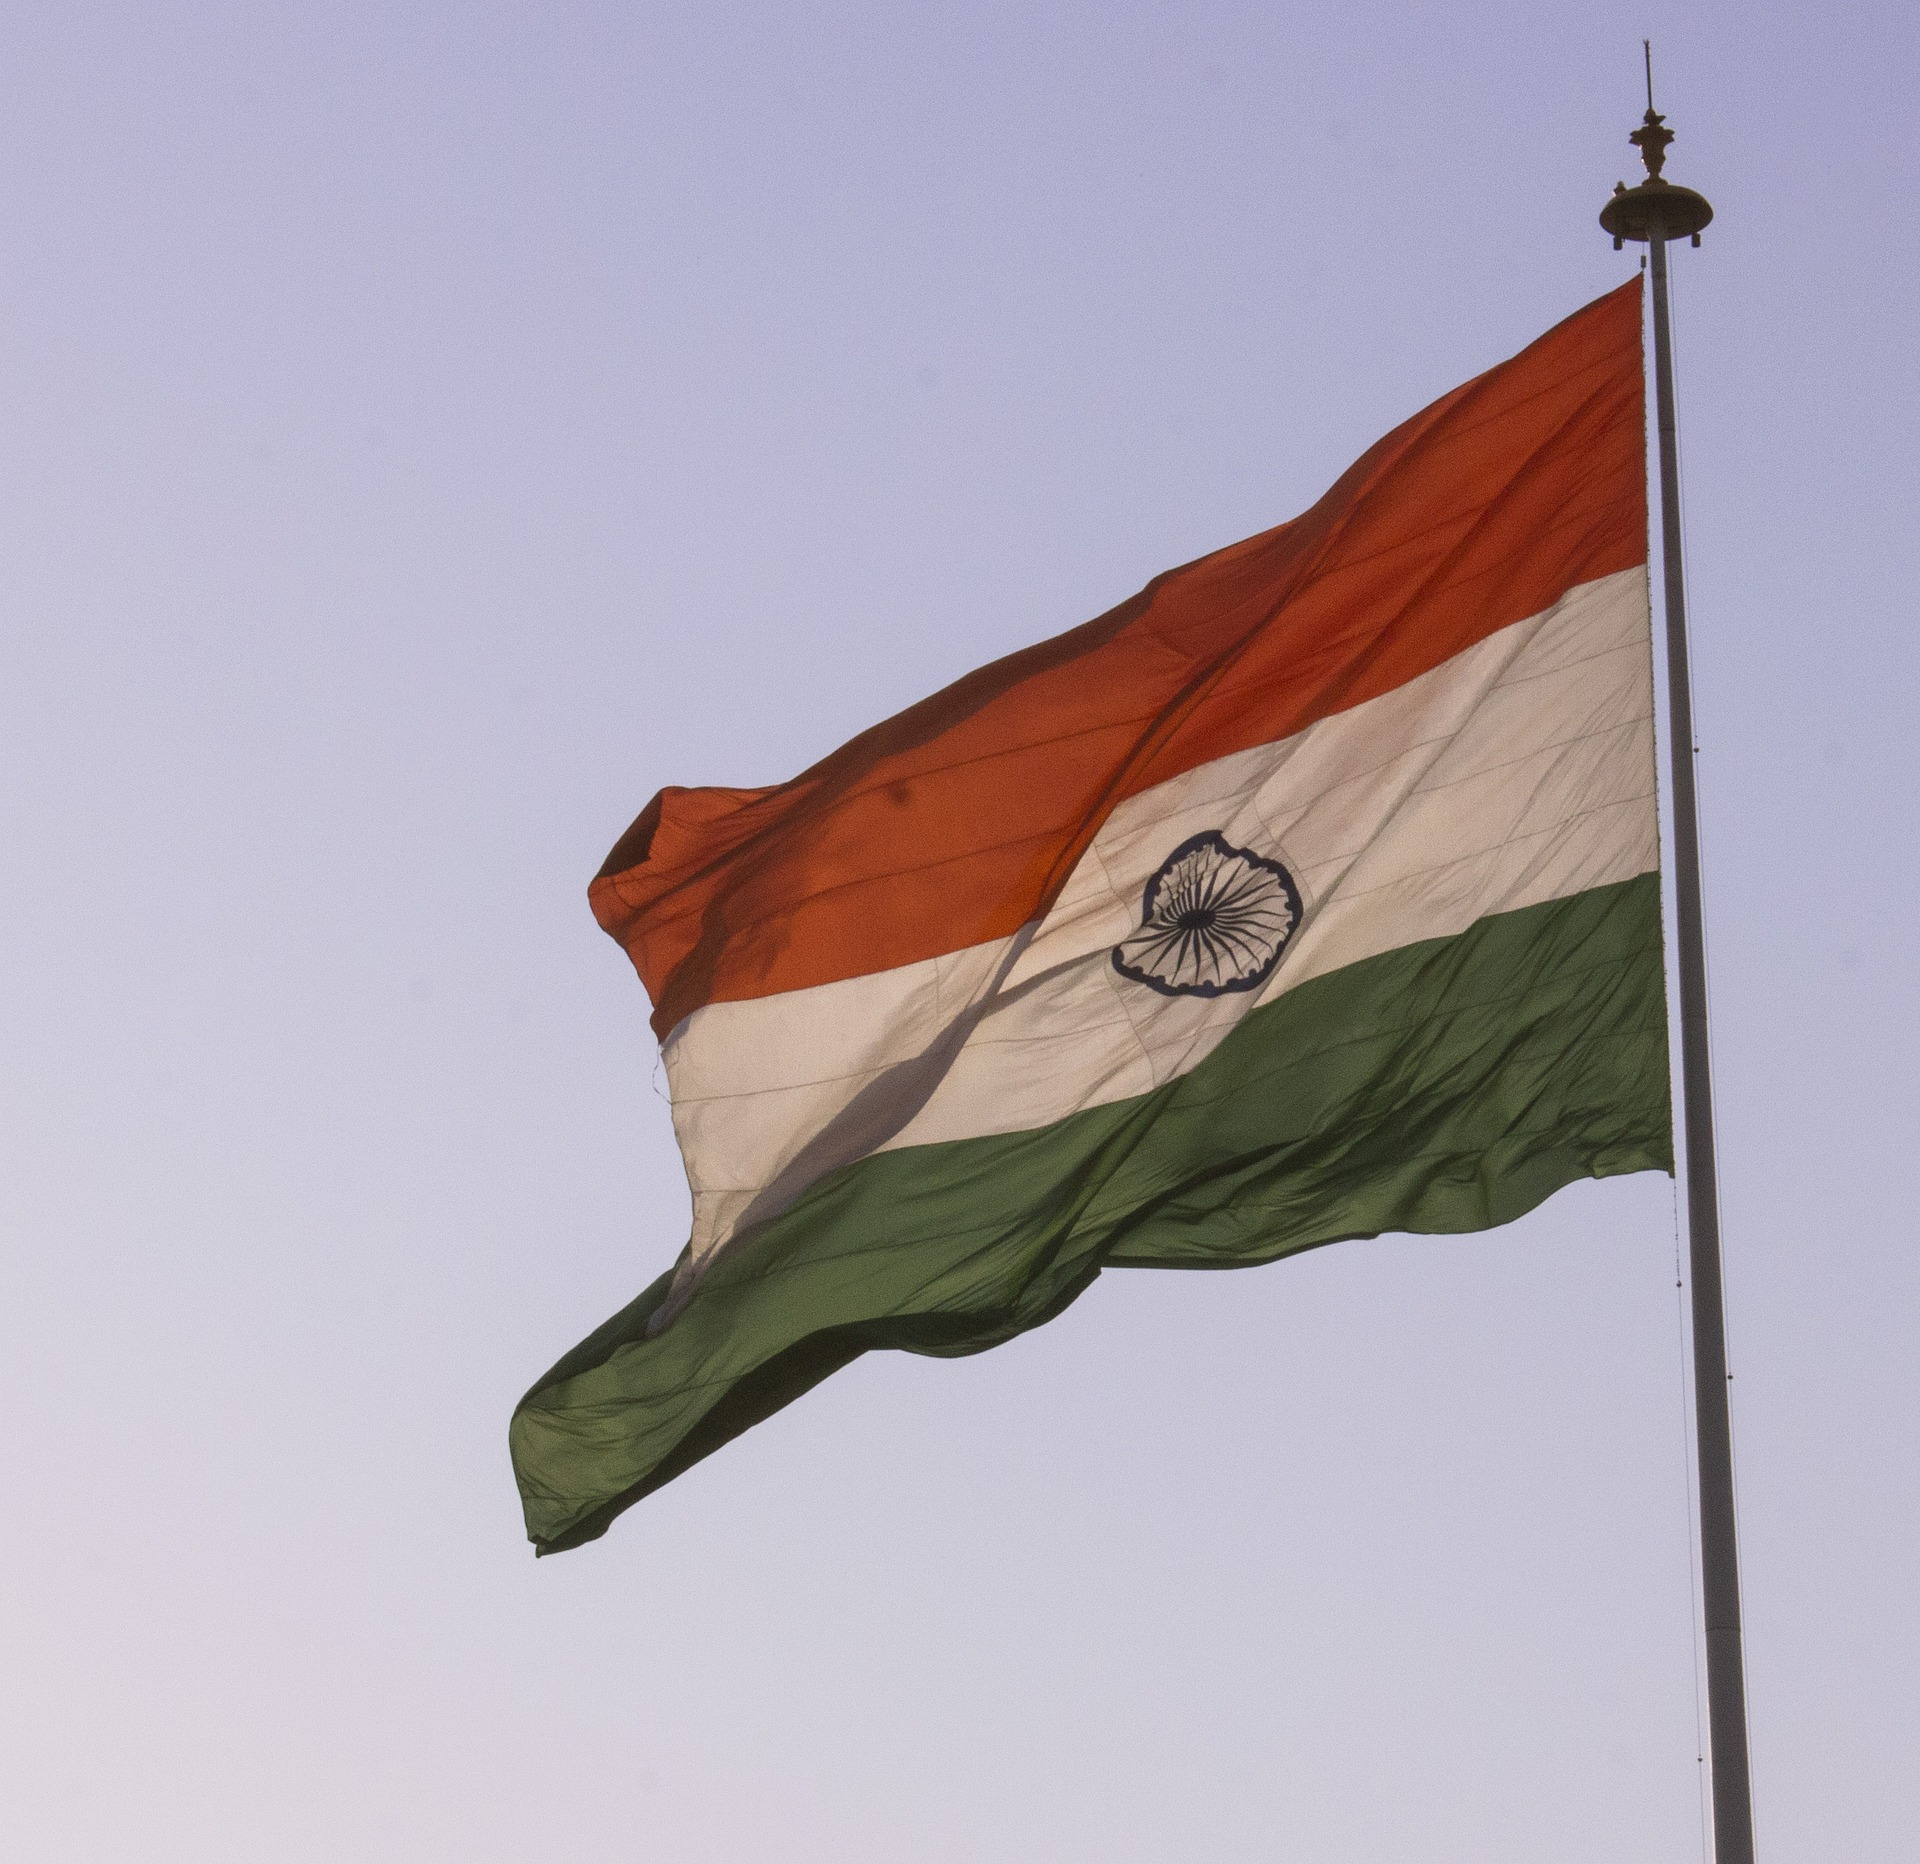 turismo india bandera